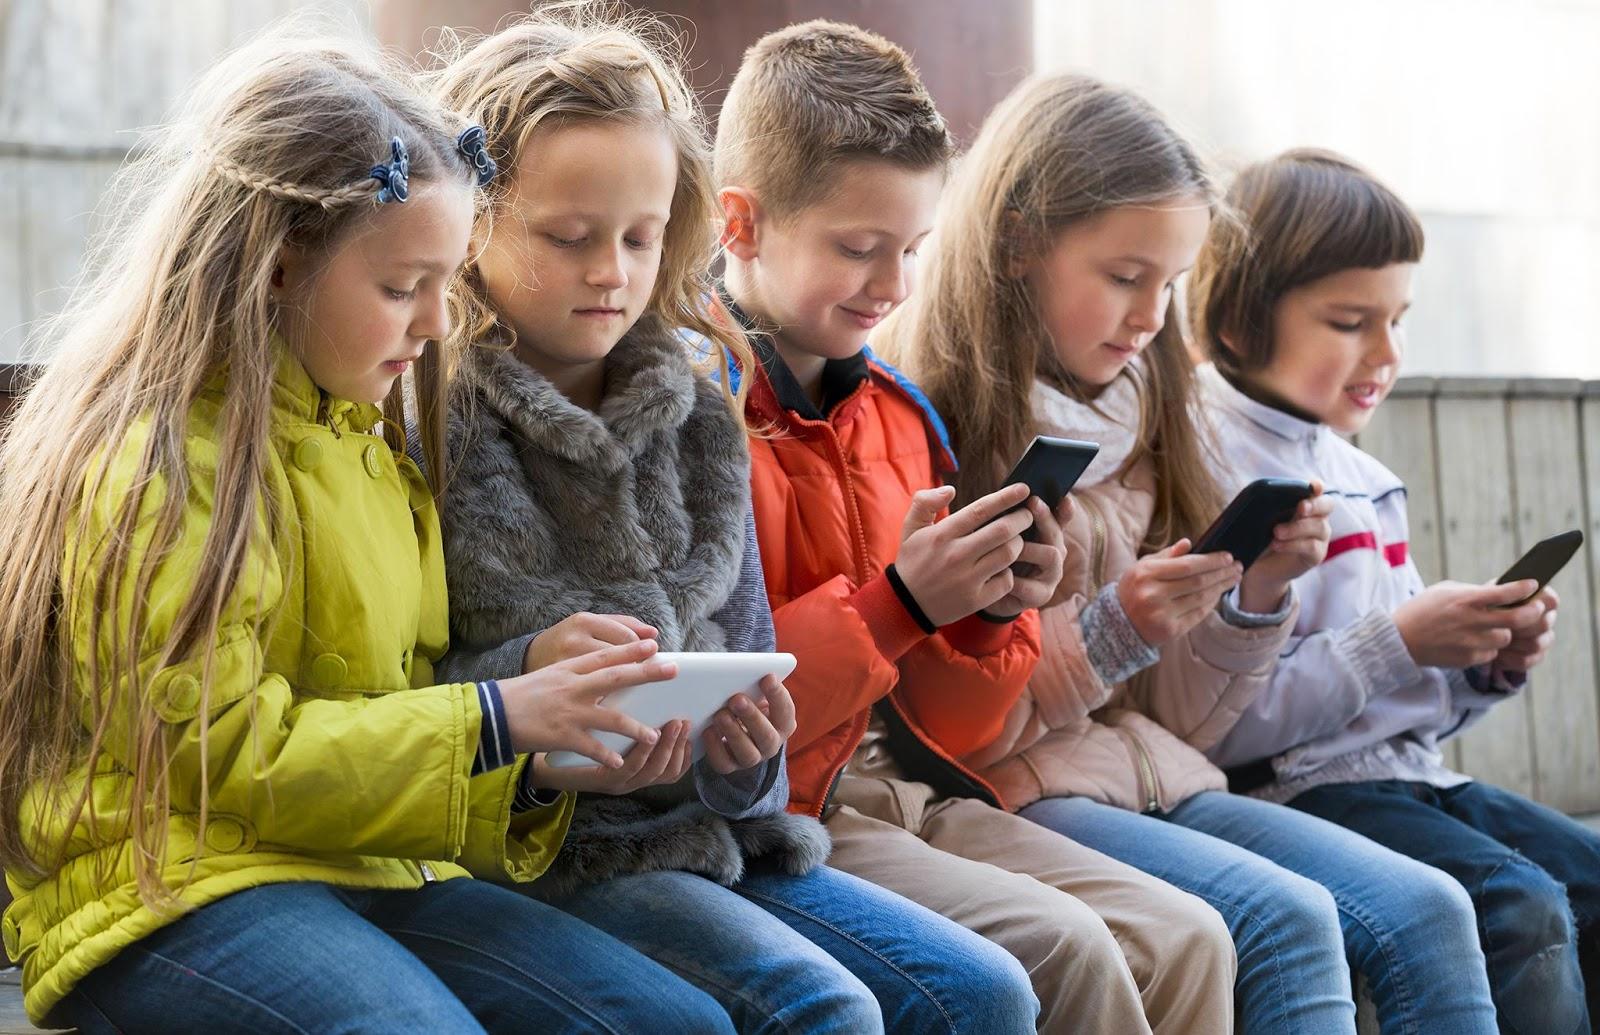 protecting kids from internet predators